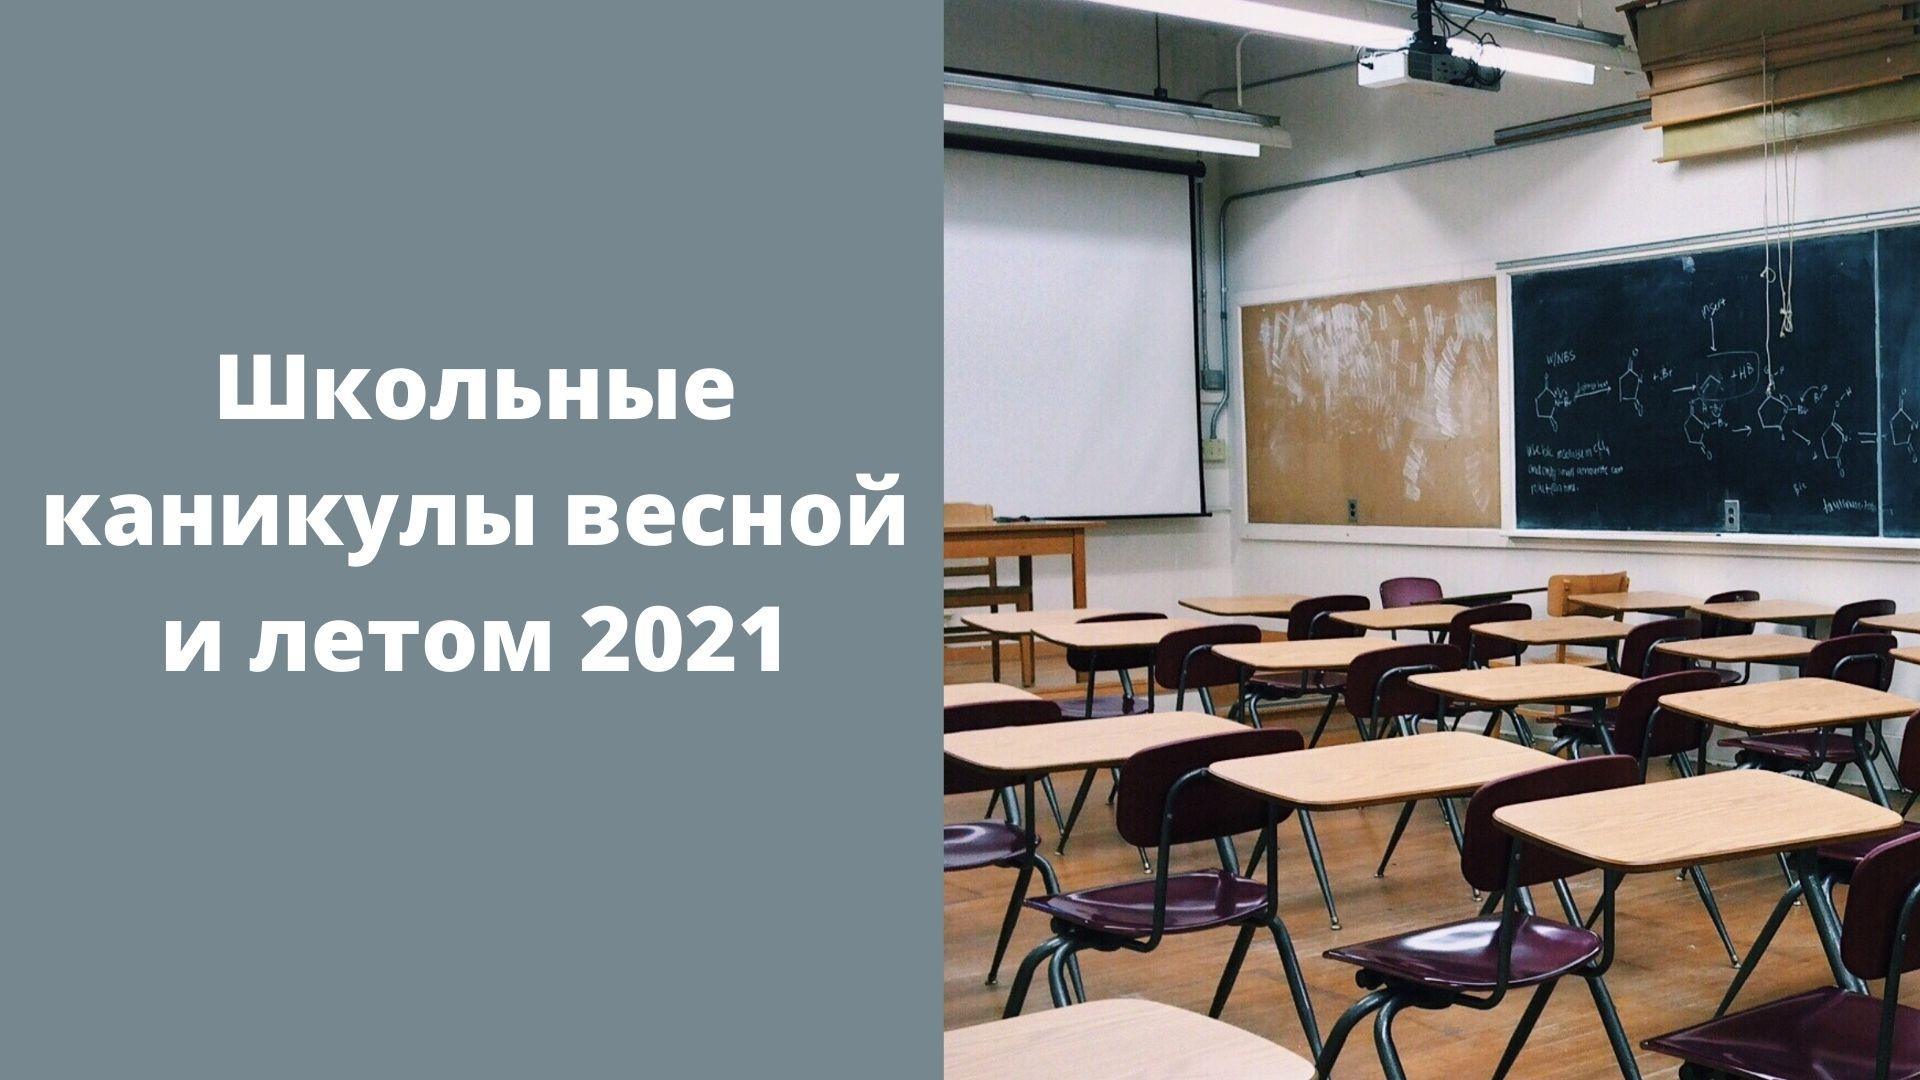 Каникулы в школах 2021